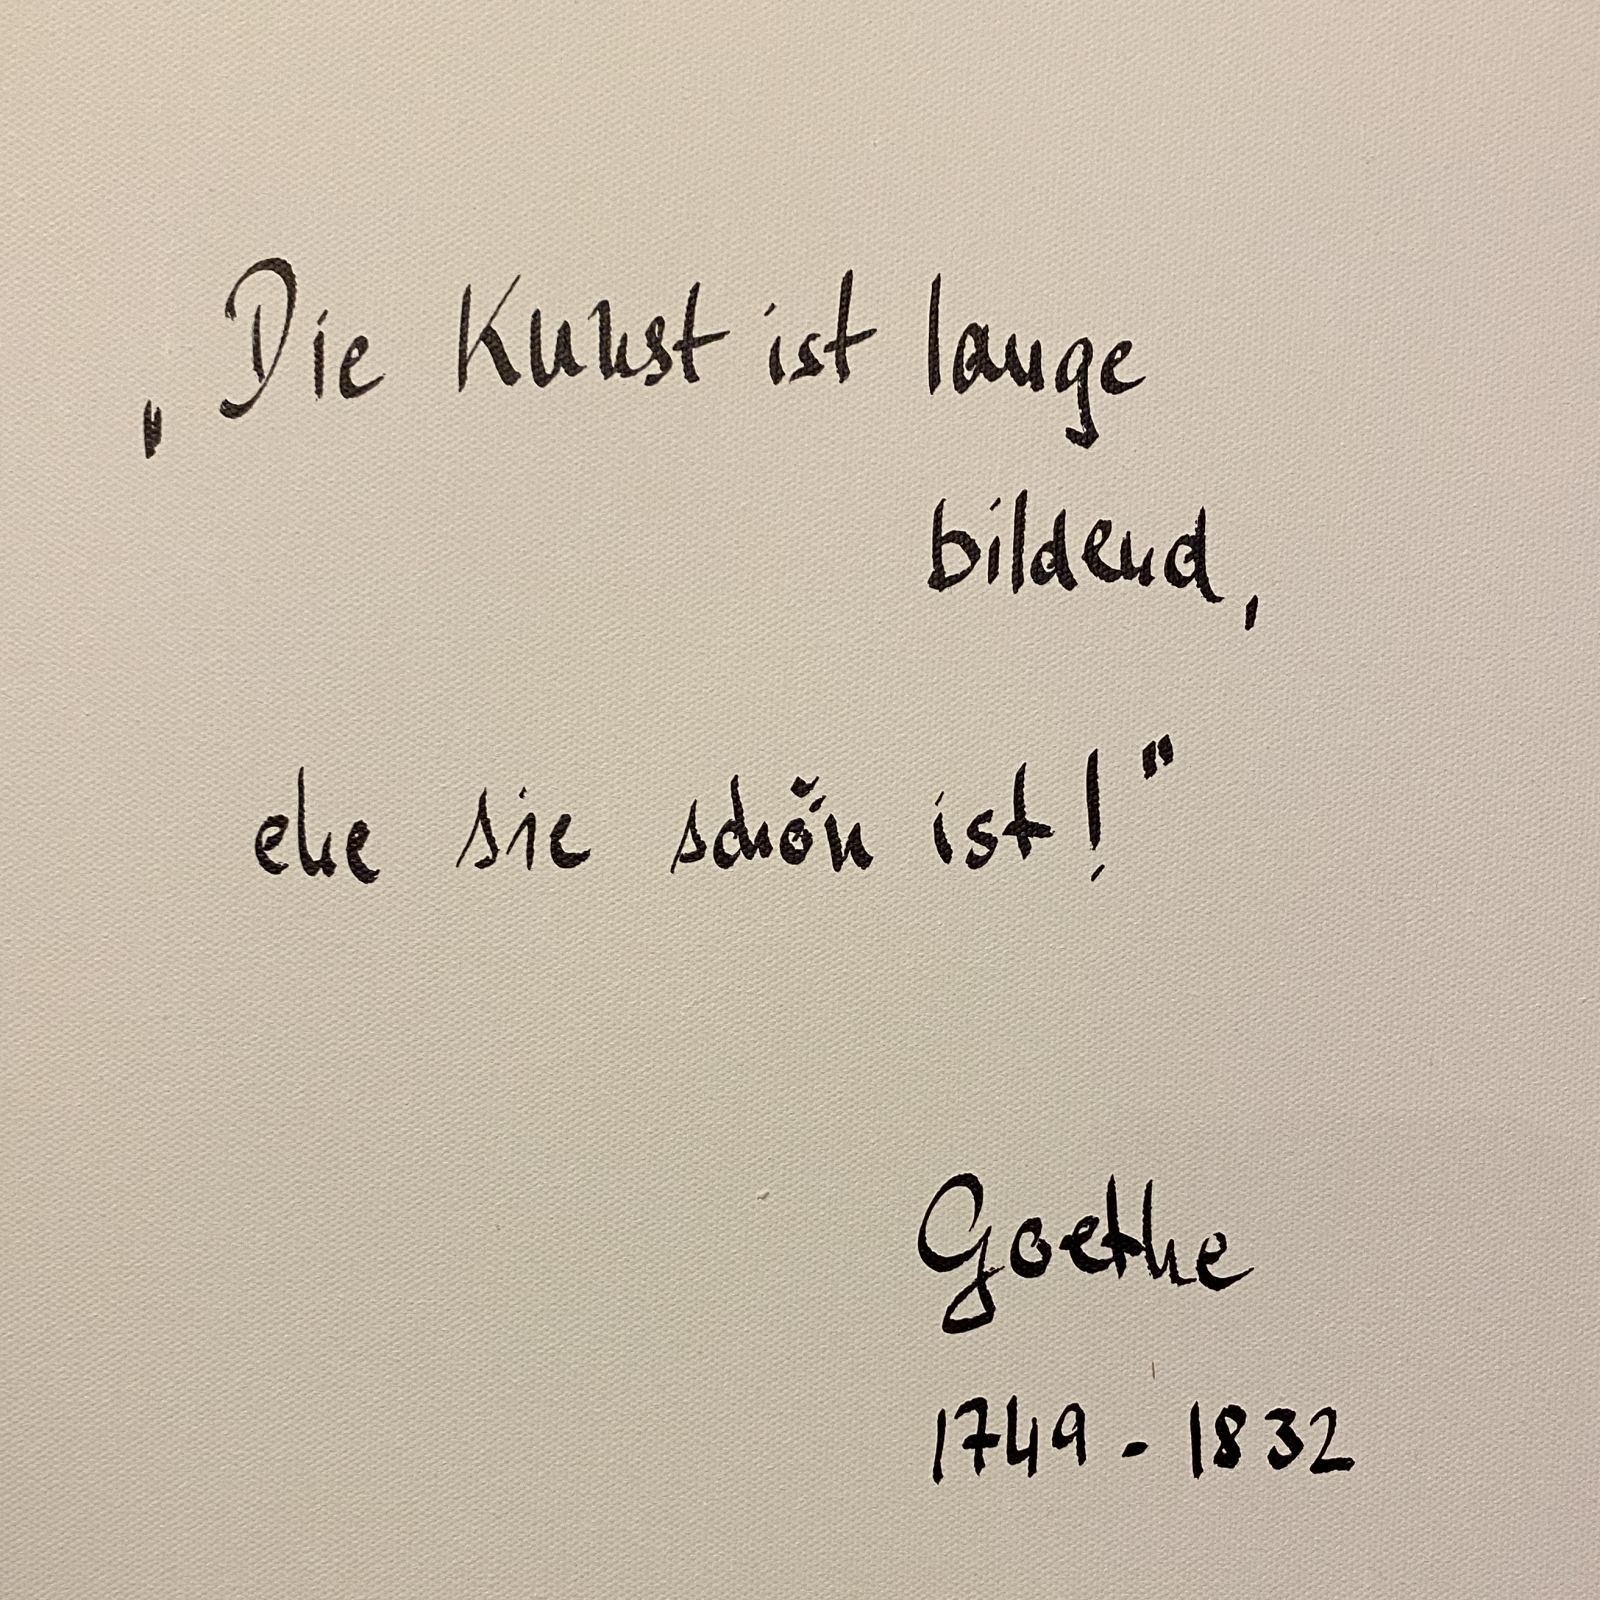 Goethe von Dr. h. c. Petra Roth